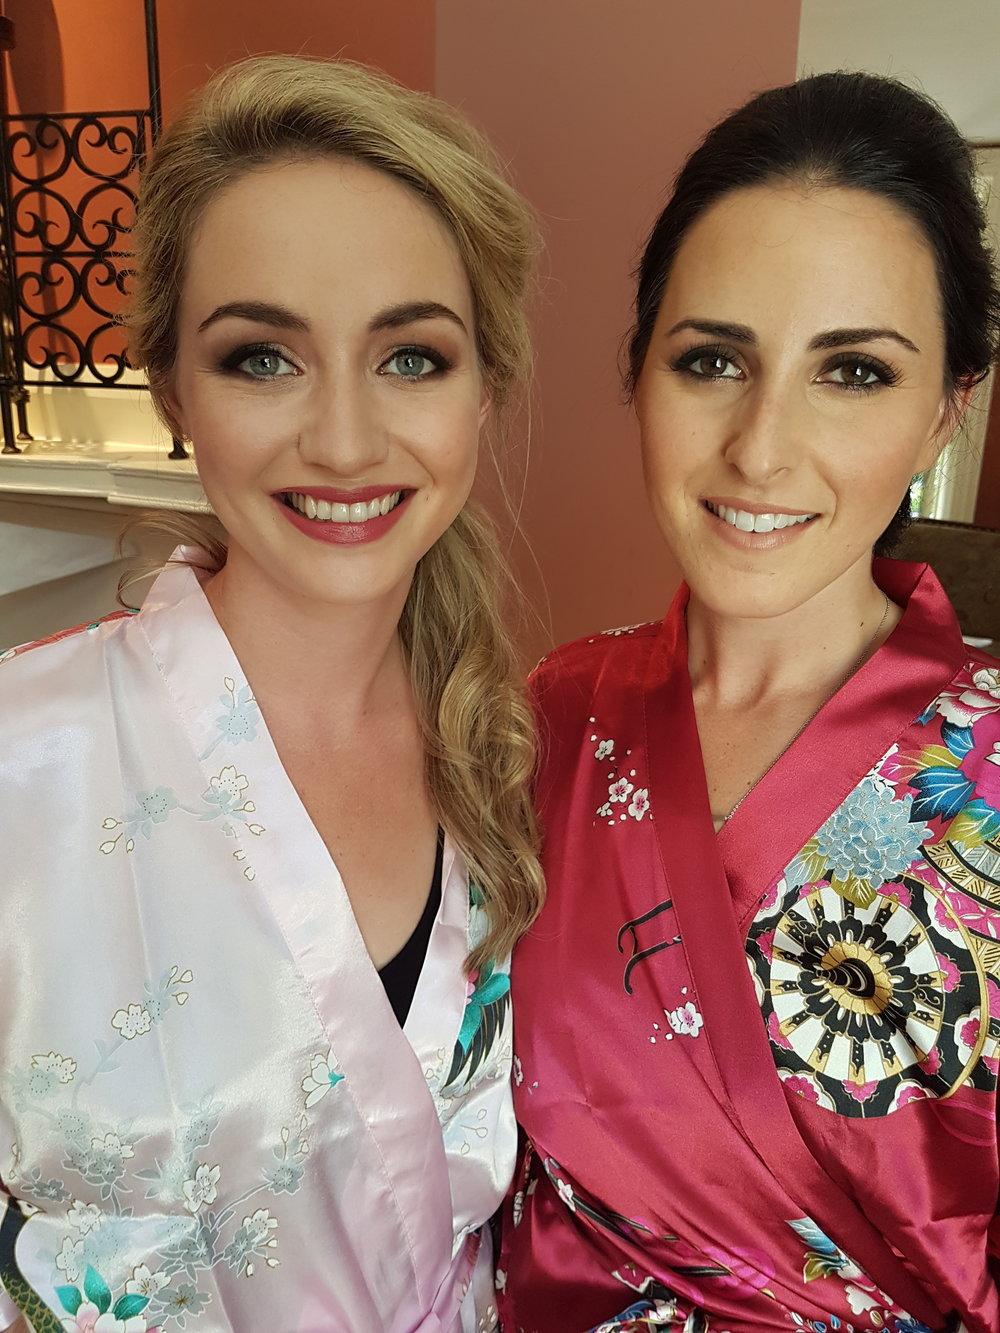 makeup_nicole_richards_whitby_bridesmaids.jpg